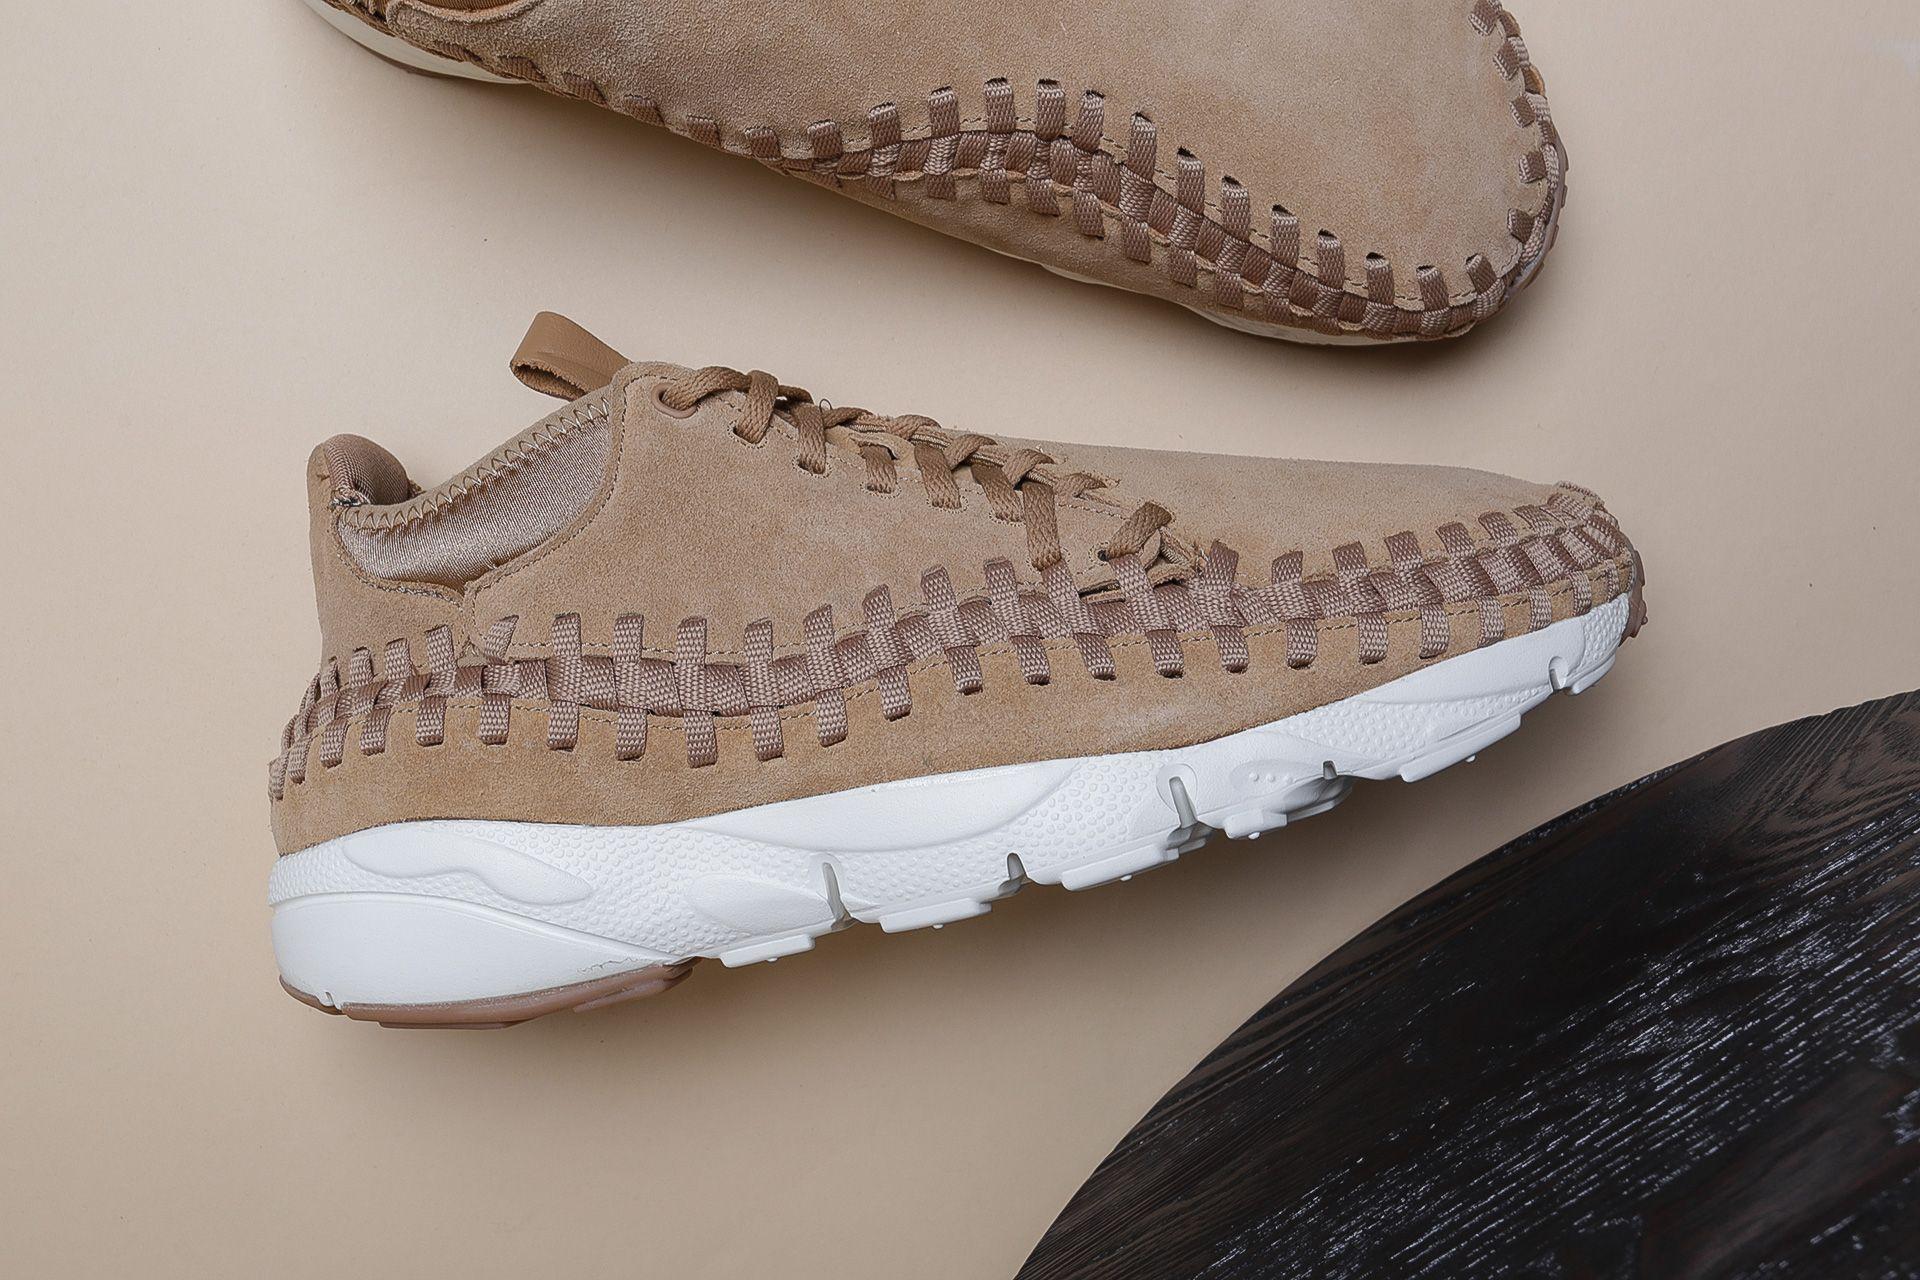 pretty nice ad578 e70c5 ... Купить мужские кроссовки Nike Air Footscape Woven Chukka - фото 2  картинки ...